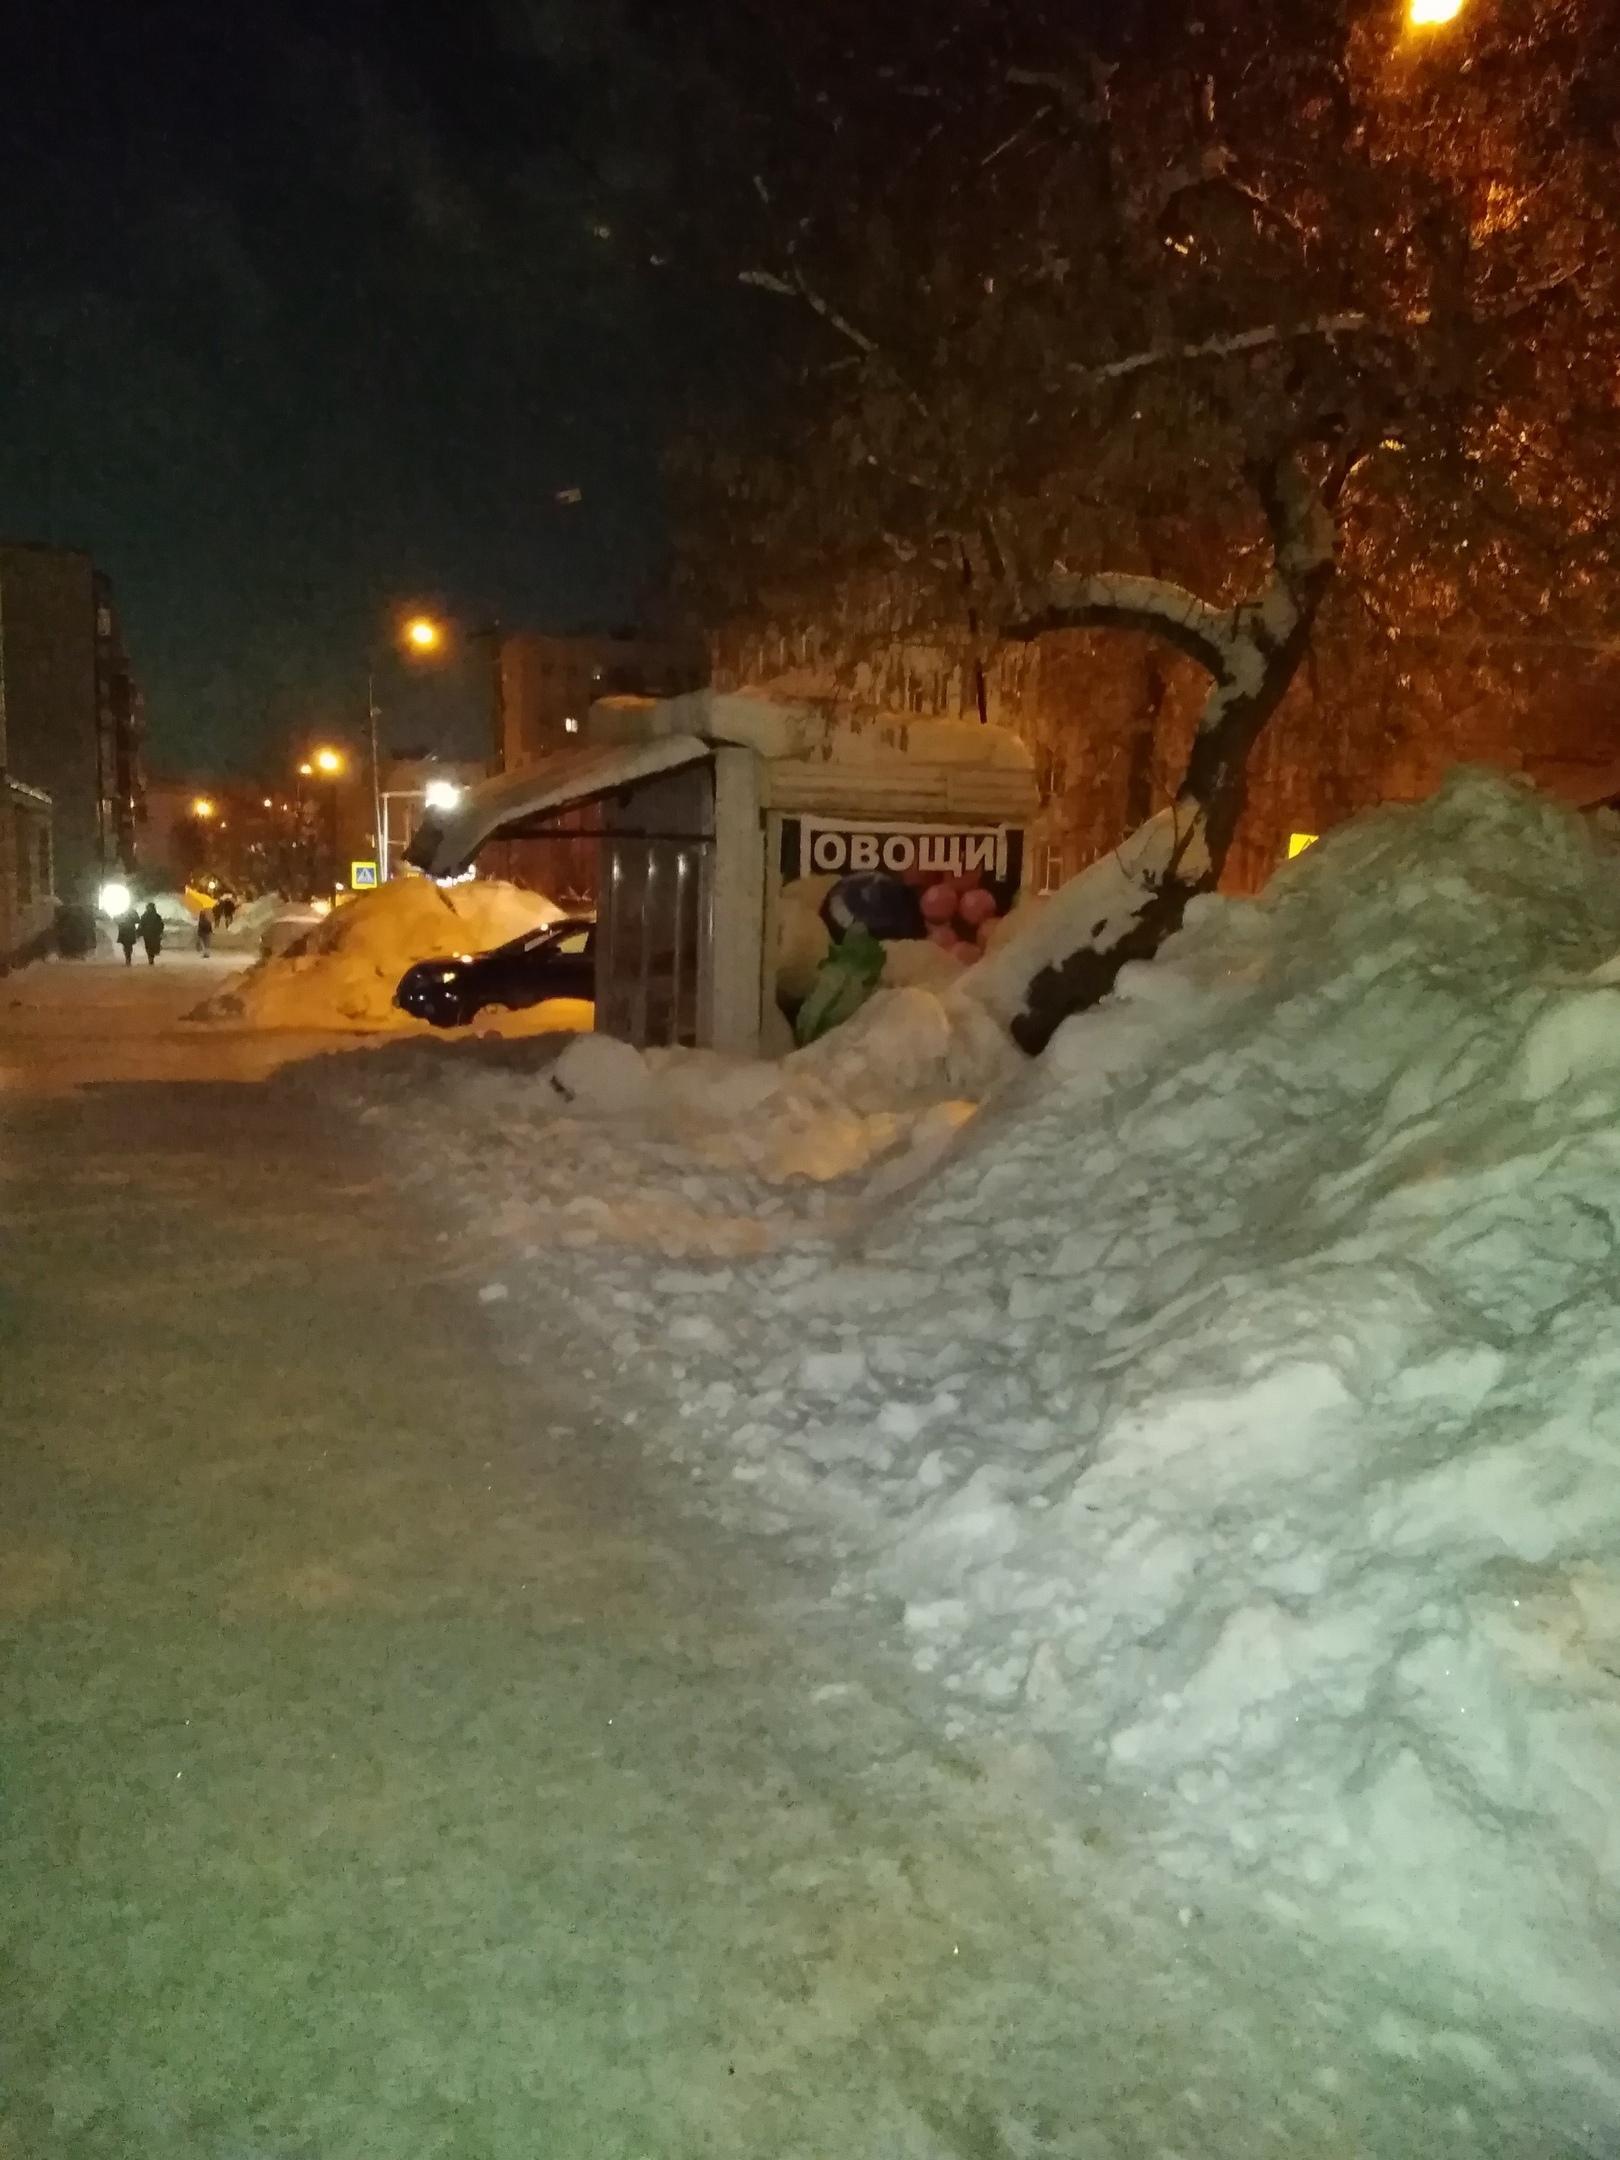 Фото Прокуратура проверит, как с улиц Новосибирска убирают снег 2